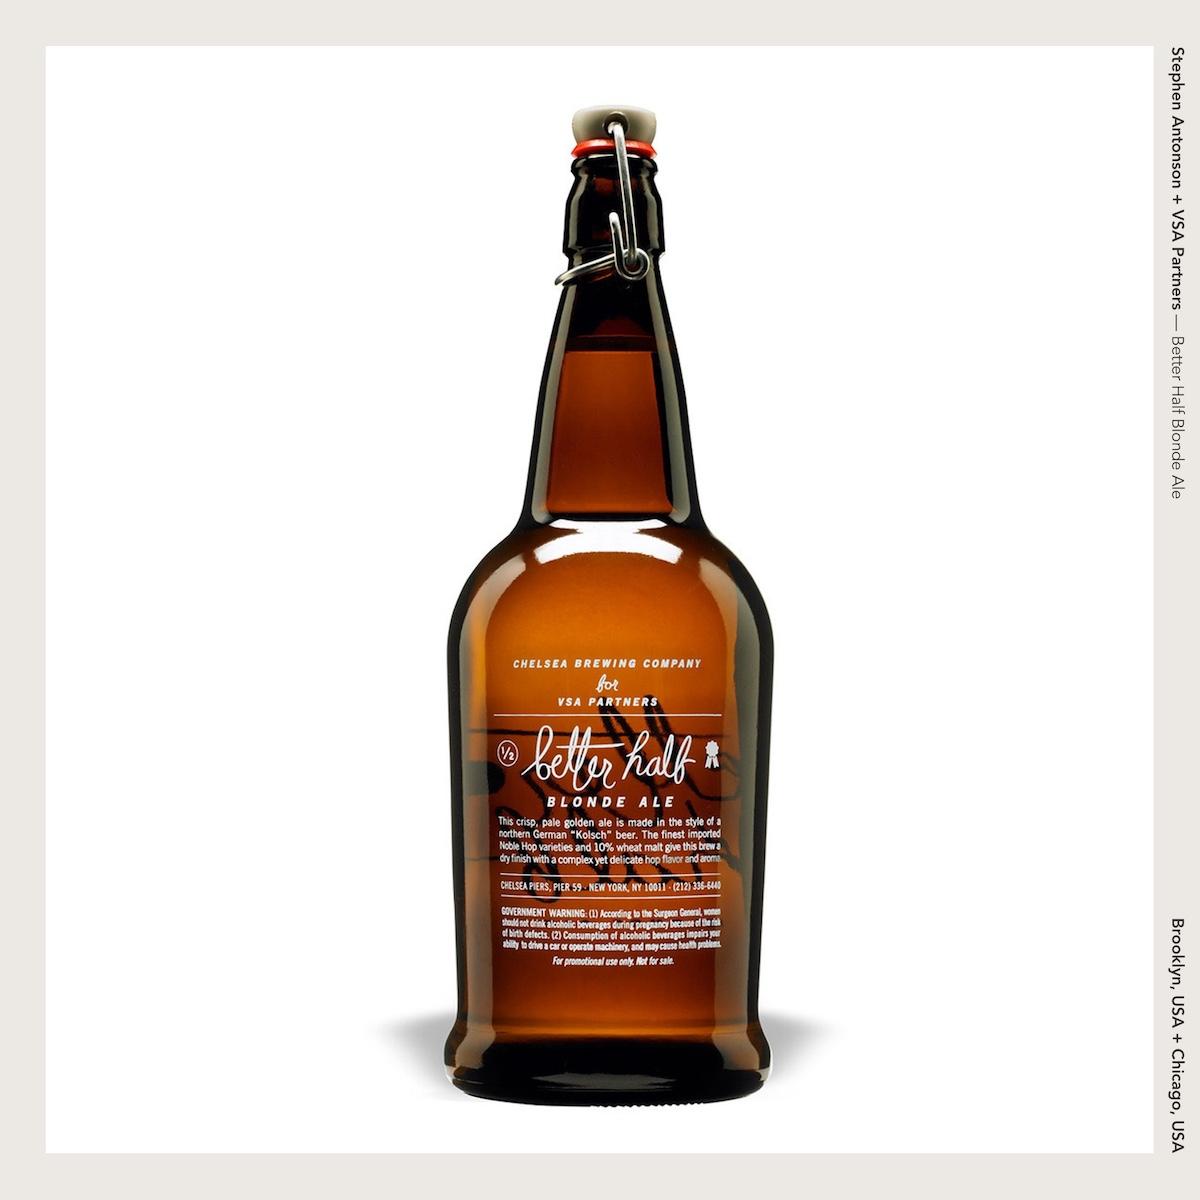 Stephen Antonson + VSA Partners —Better Half Blonde Ale